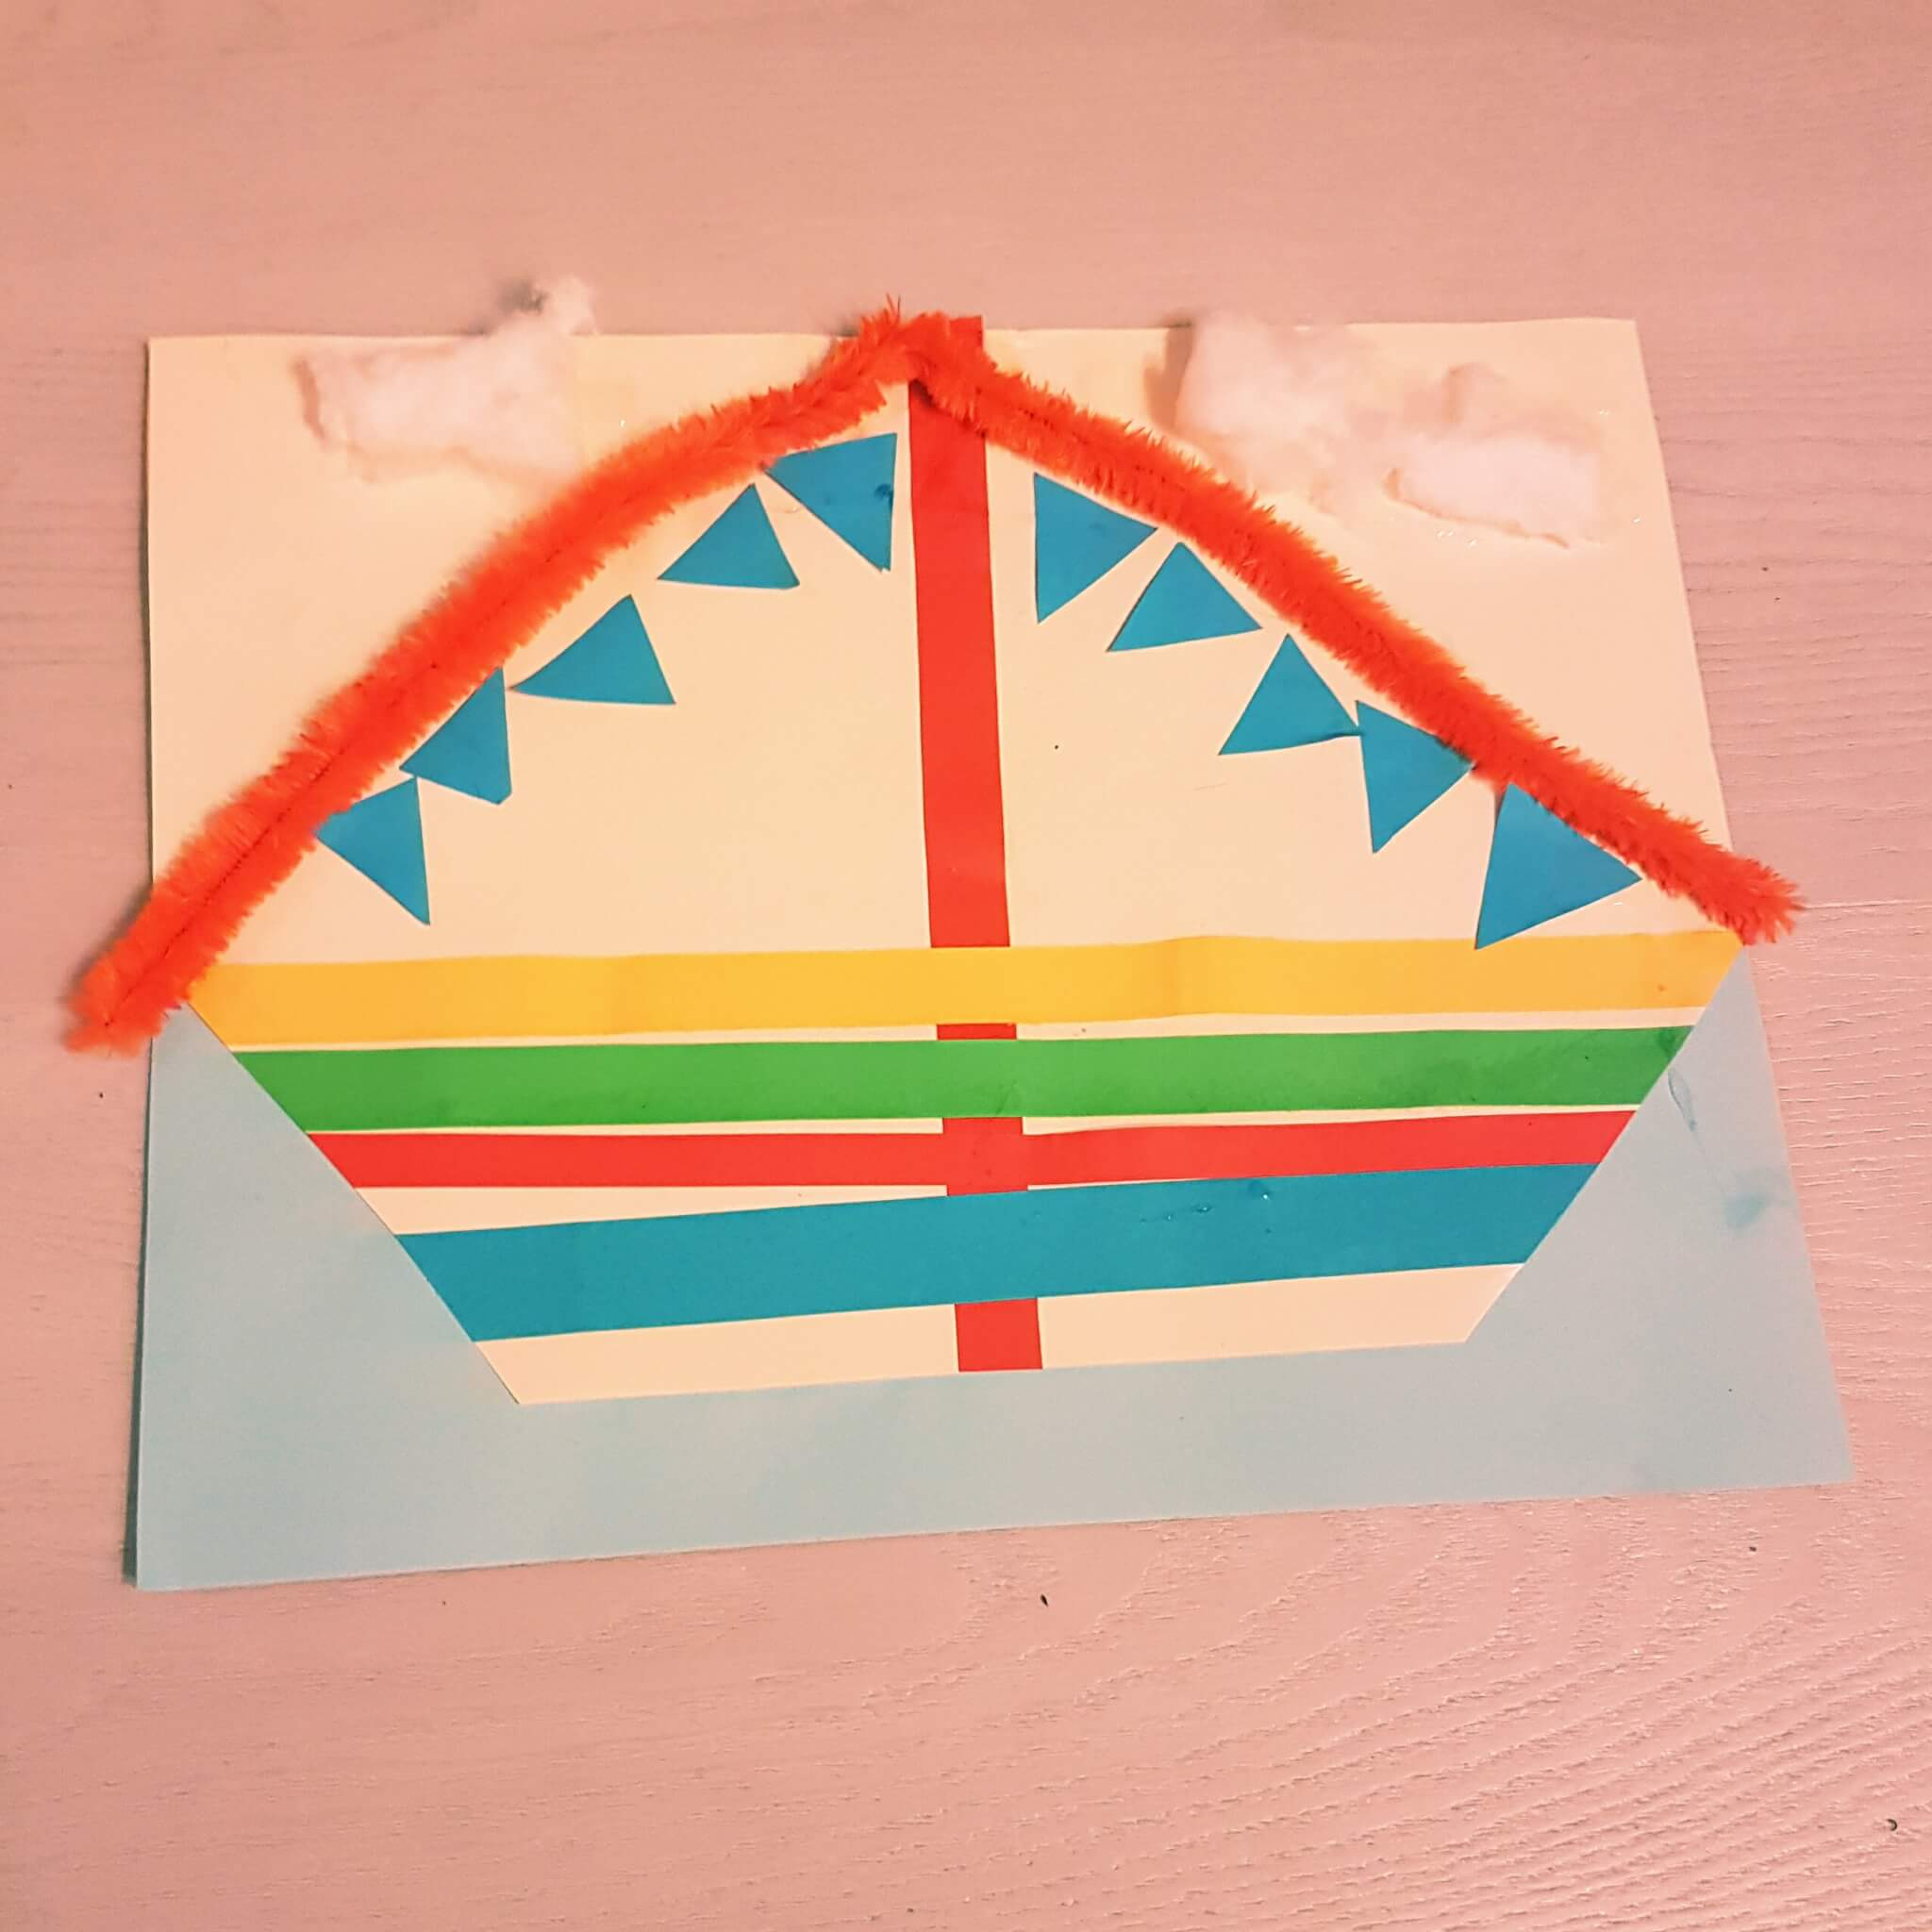 Kleurplaten Thema Sinterklaas.Sinterklaas 101 Ideeen Om Te Knutselen Leuk Met Kids